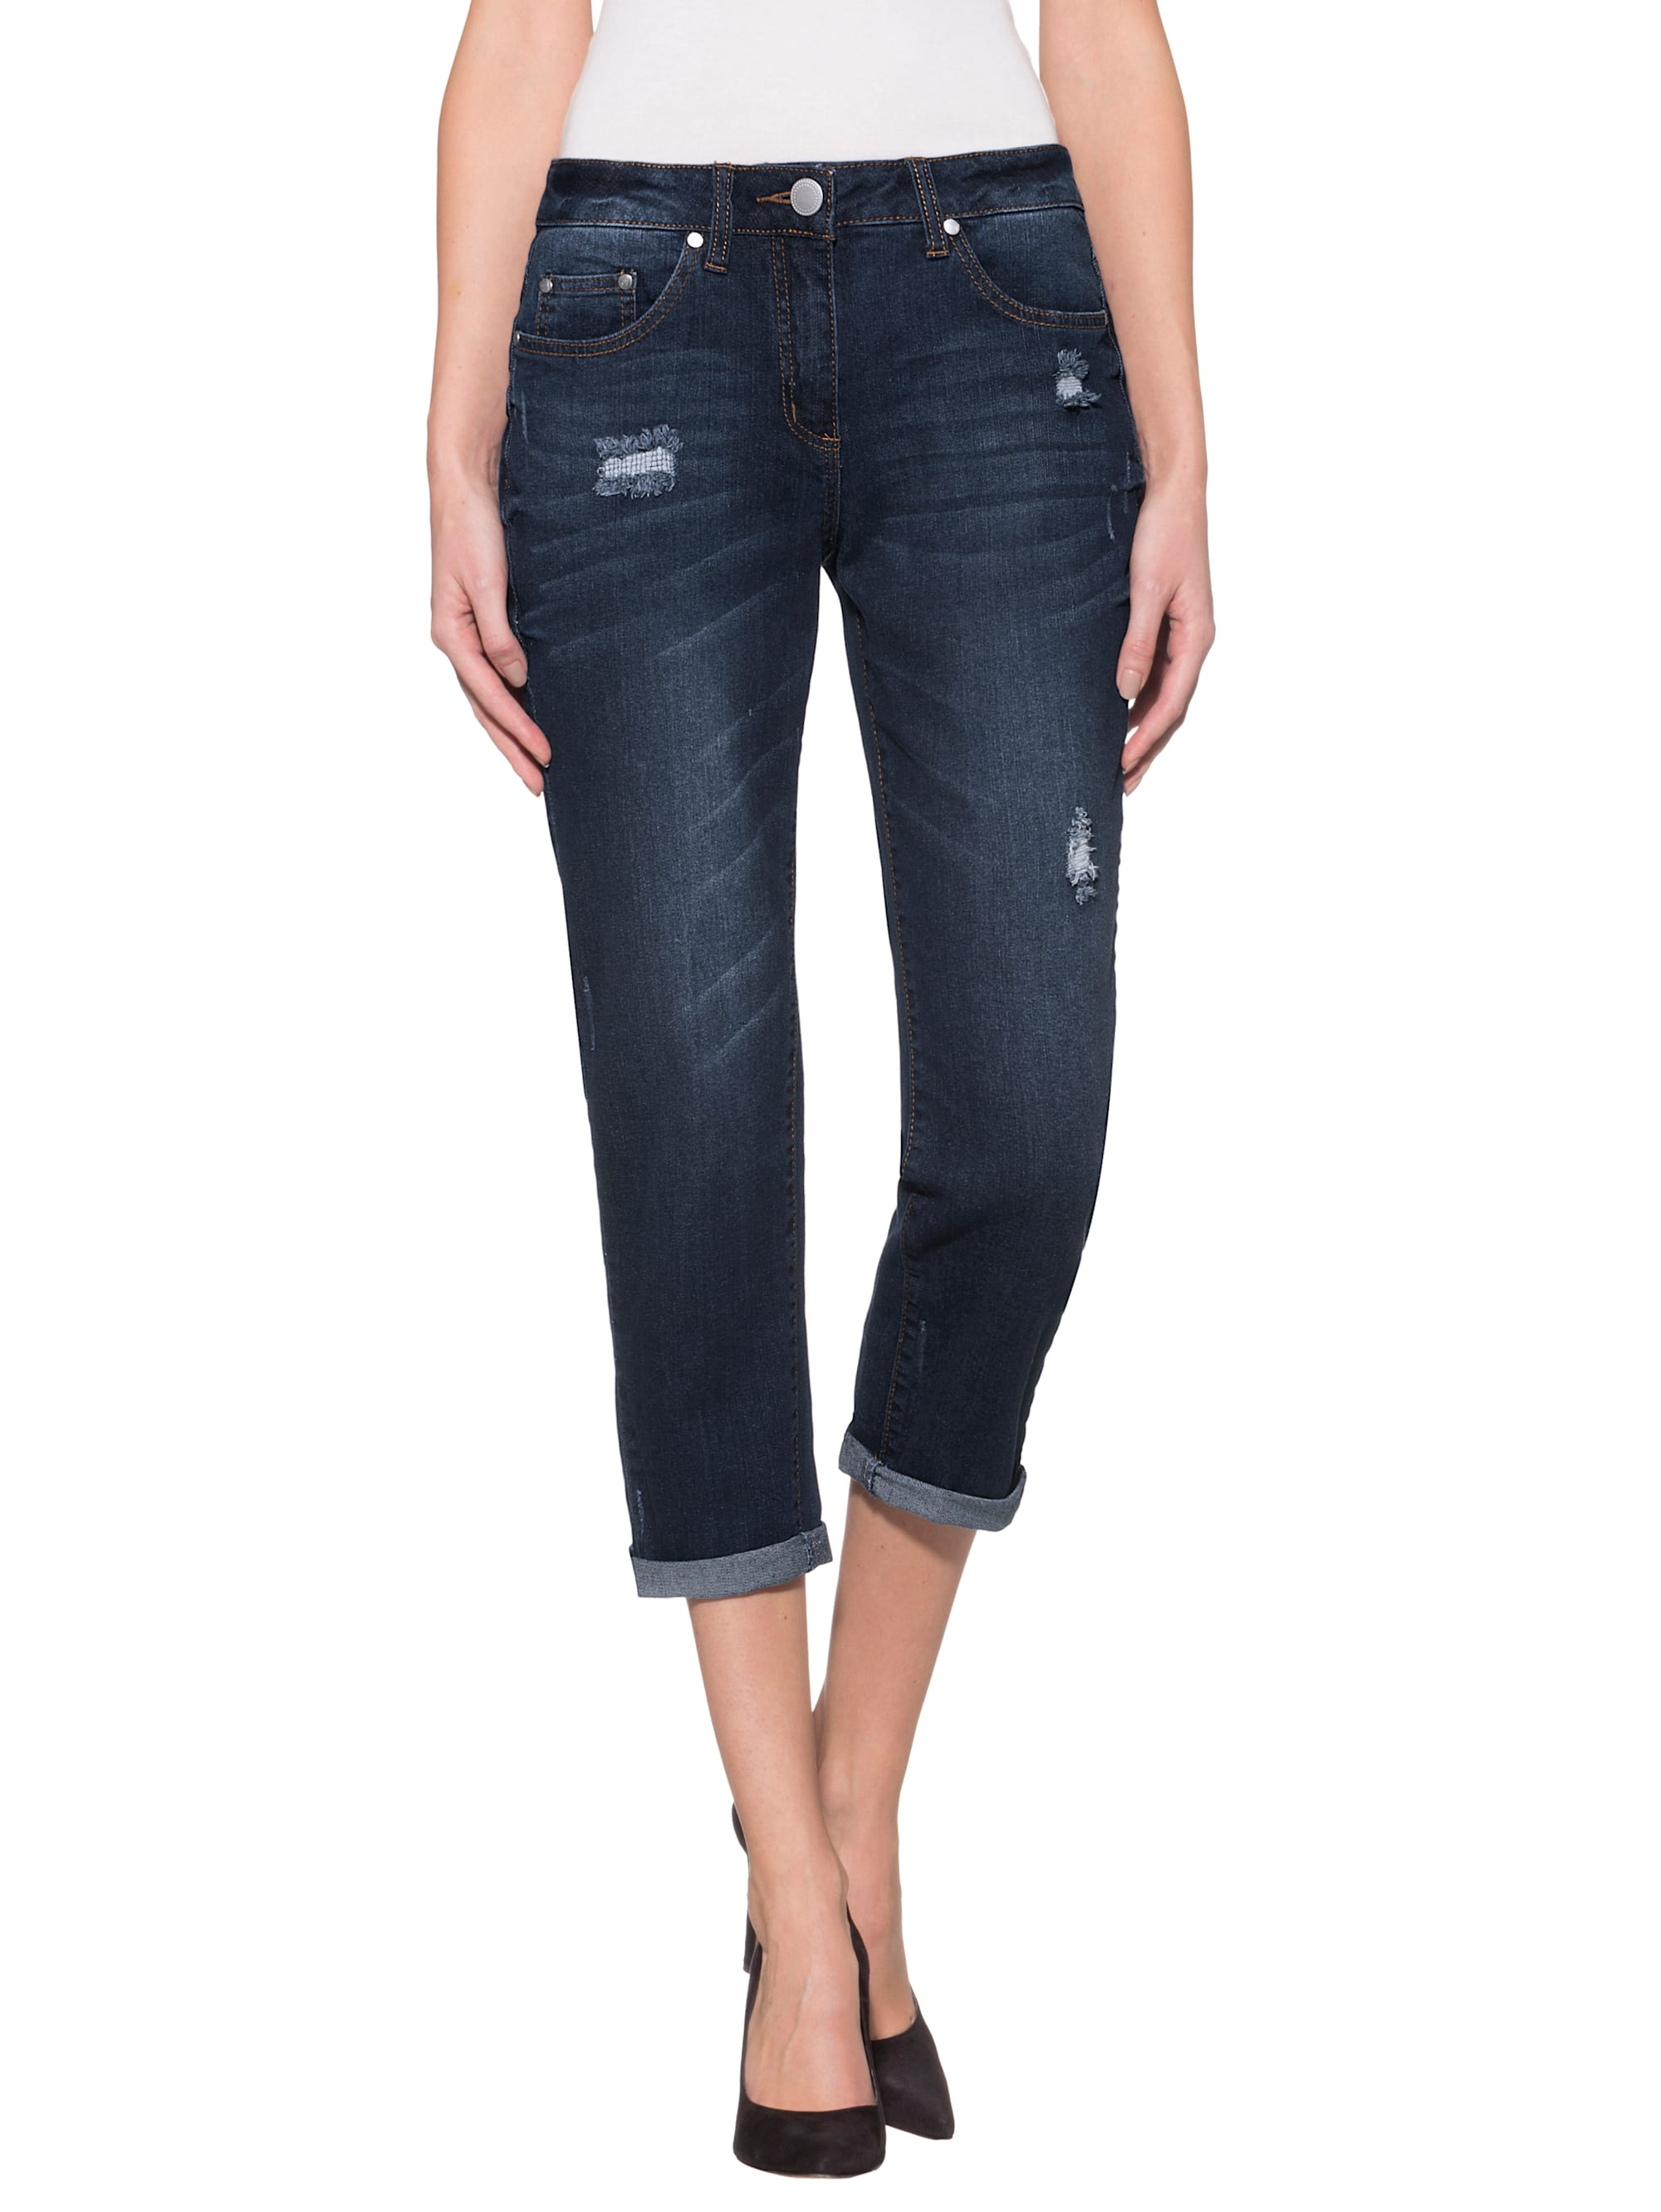 Alba Moda Jeans im Boyfriend-Style gqBUS RM6iz